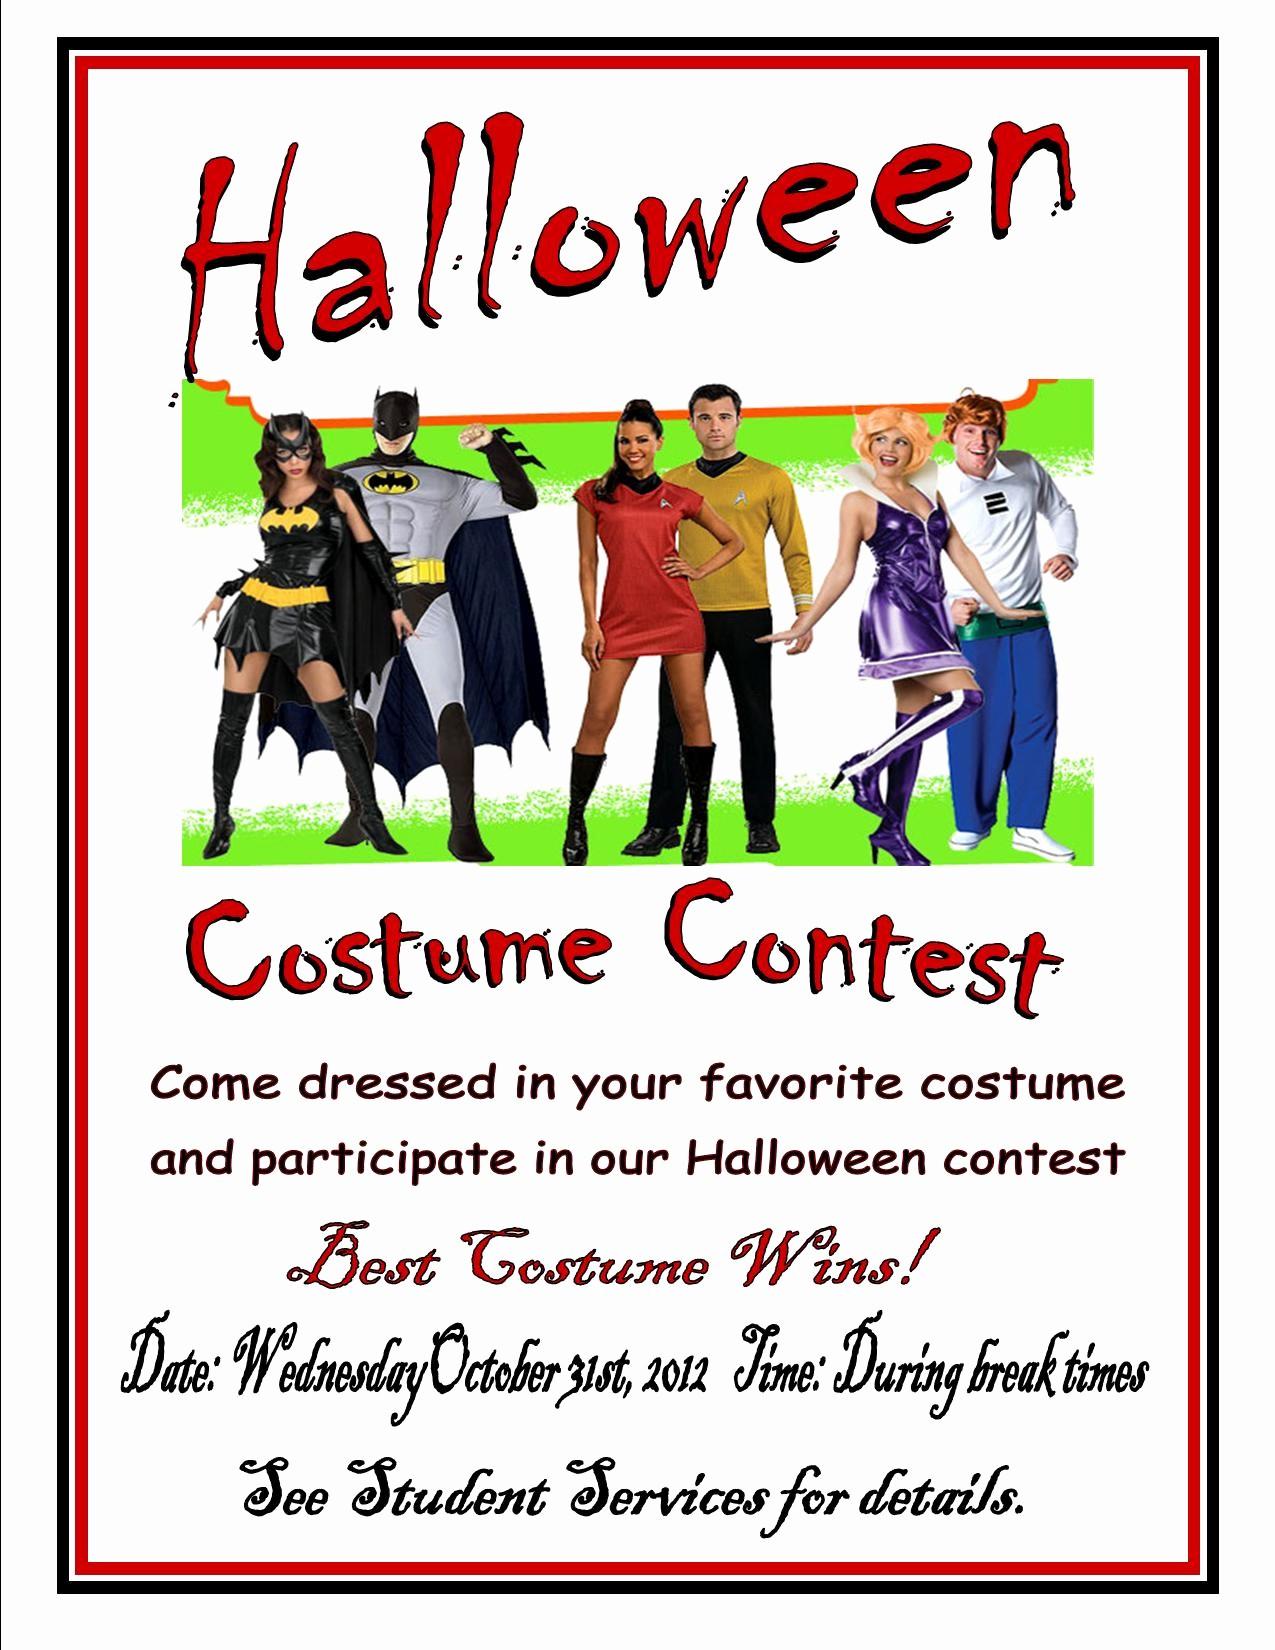 Pumpkin Carving Contest Flyer Template Inspirational Pumpkin Carving Contest Rules